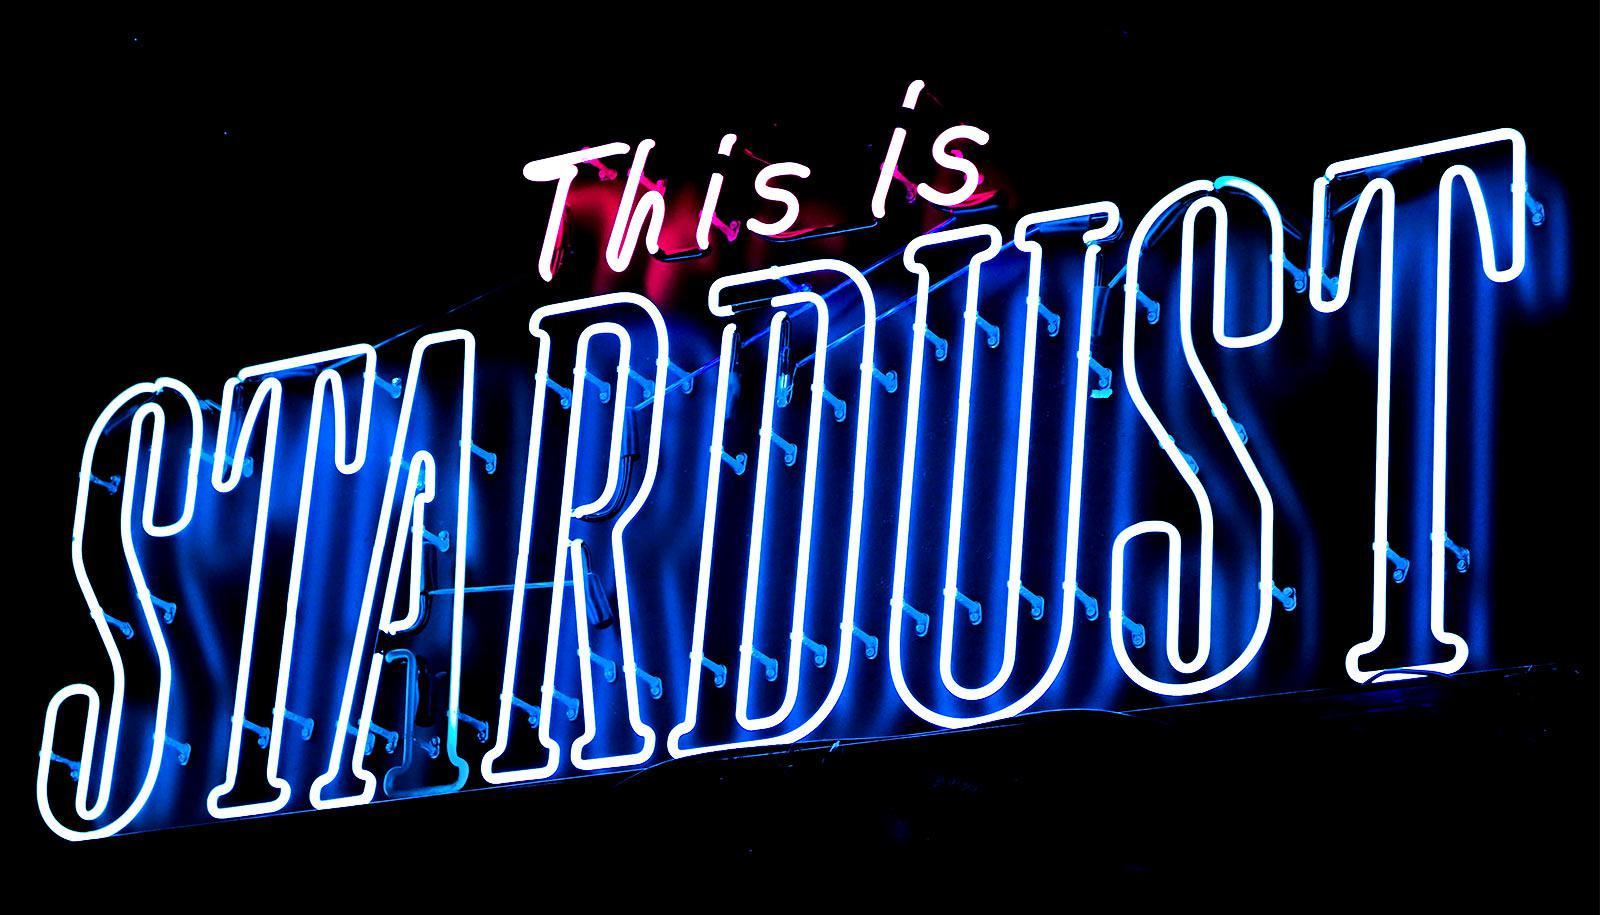 stardust neon sign